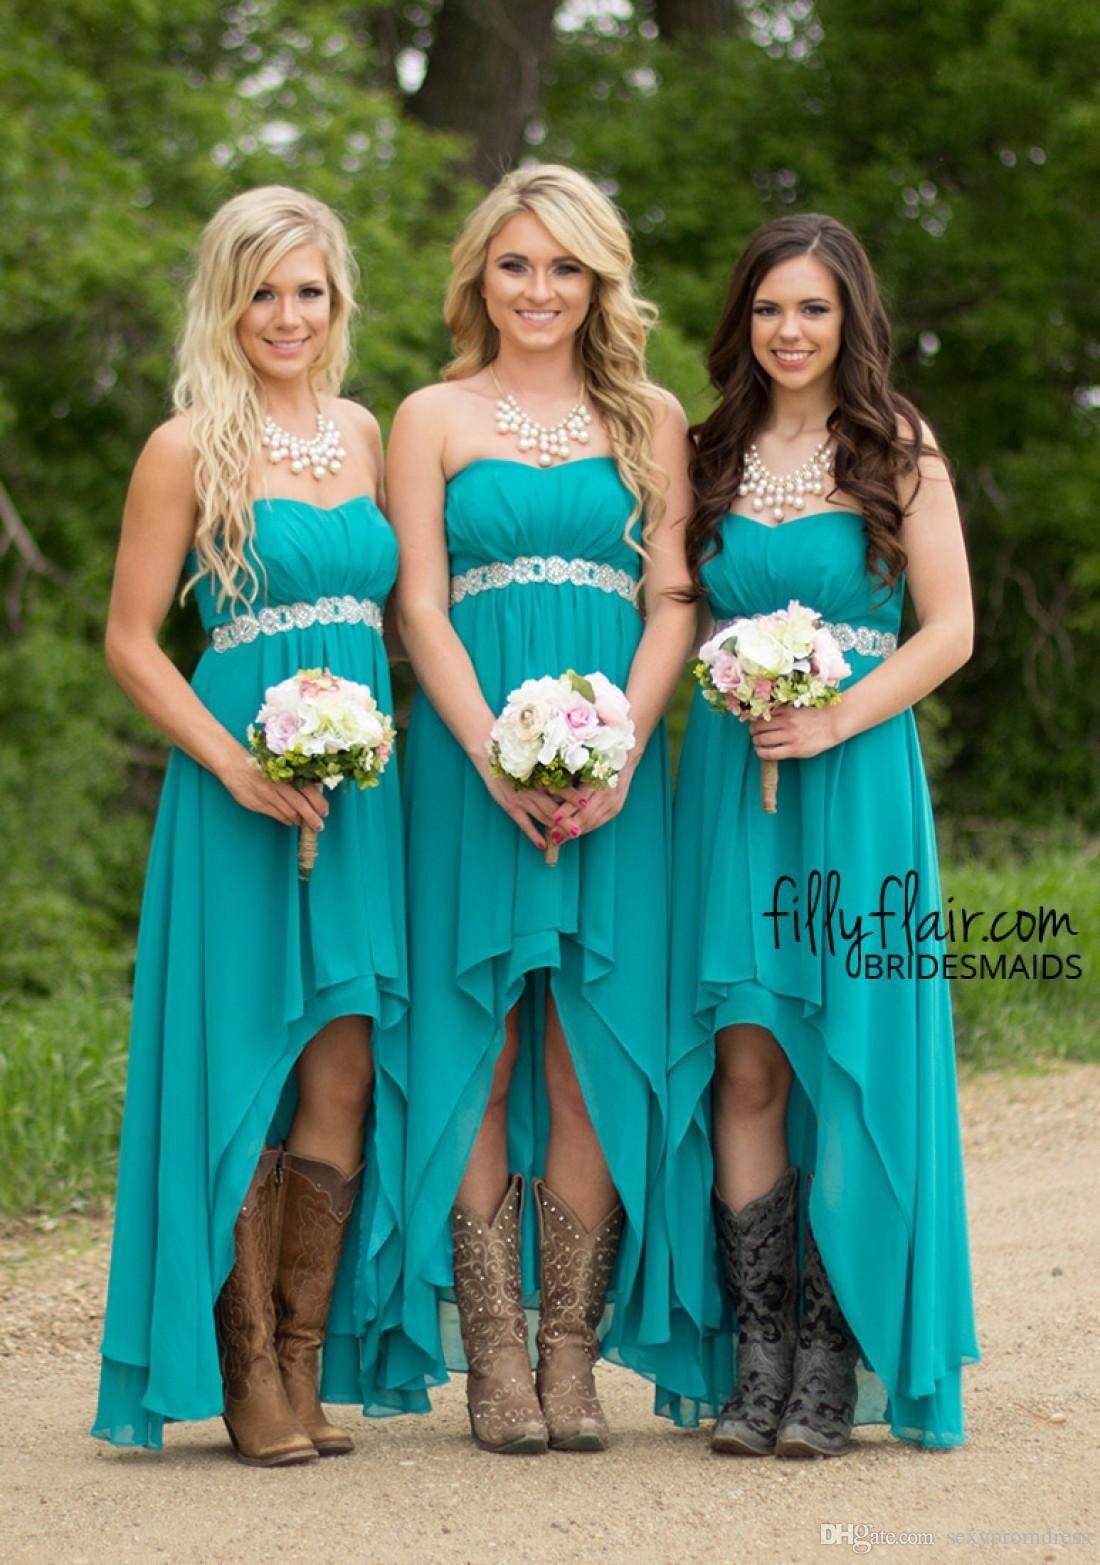 Rustic Country Burnt Orange Bridesmaid Dresses – Dresses for Woman